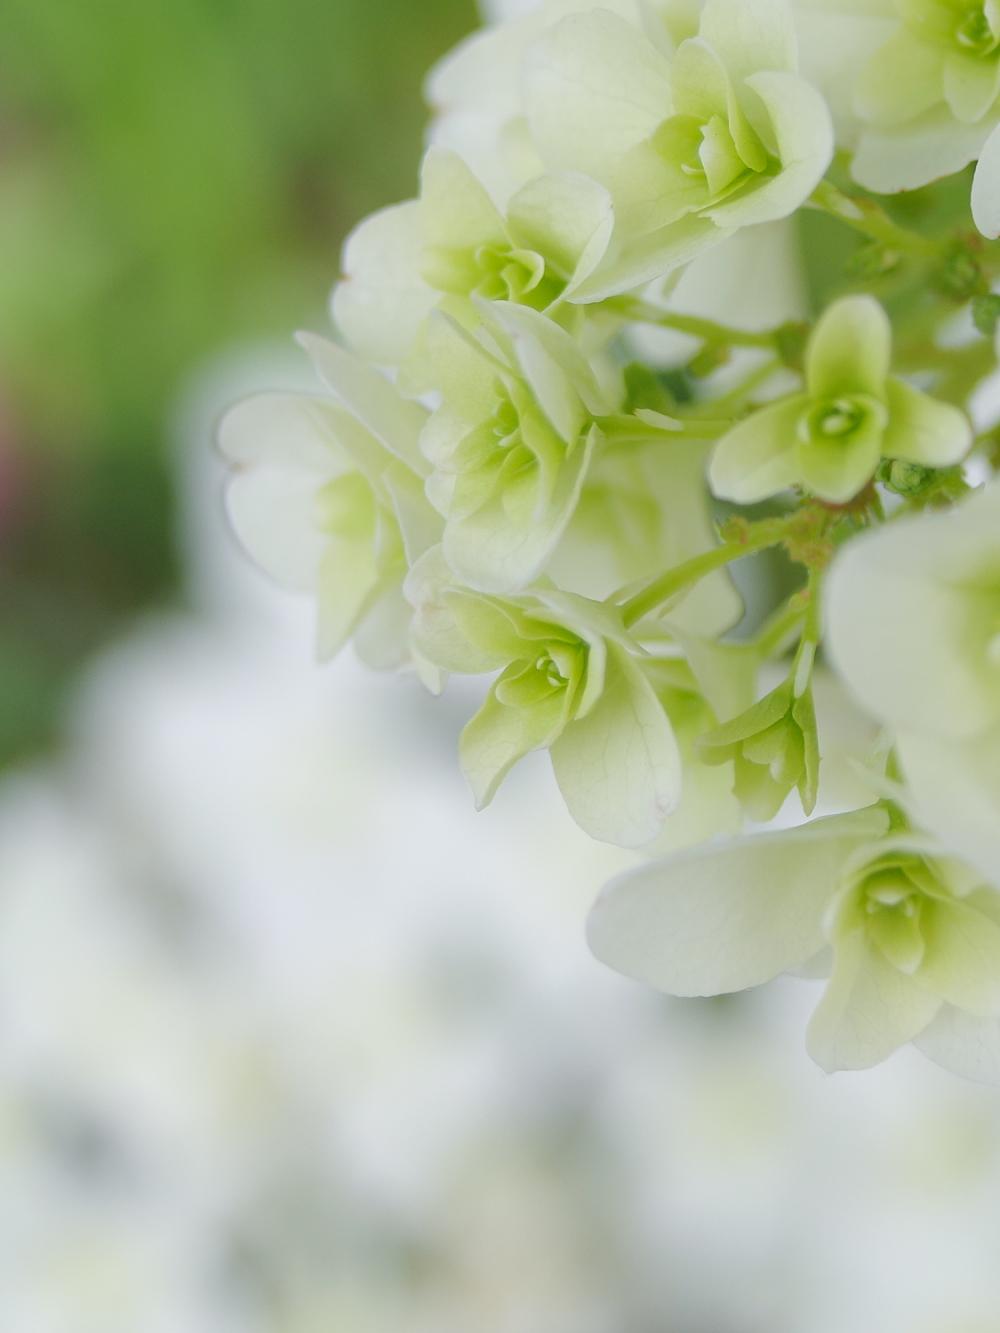 Rainy Season Flowers - 1 -